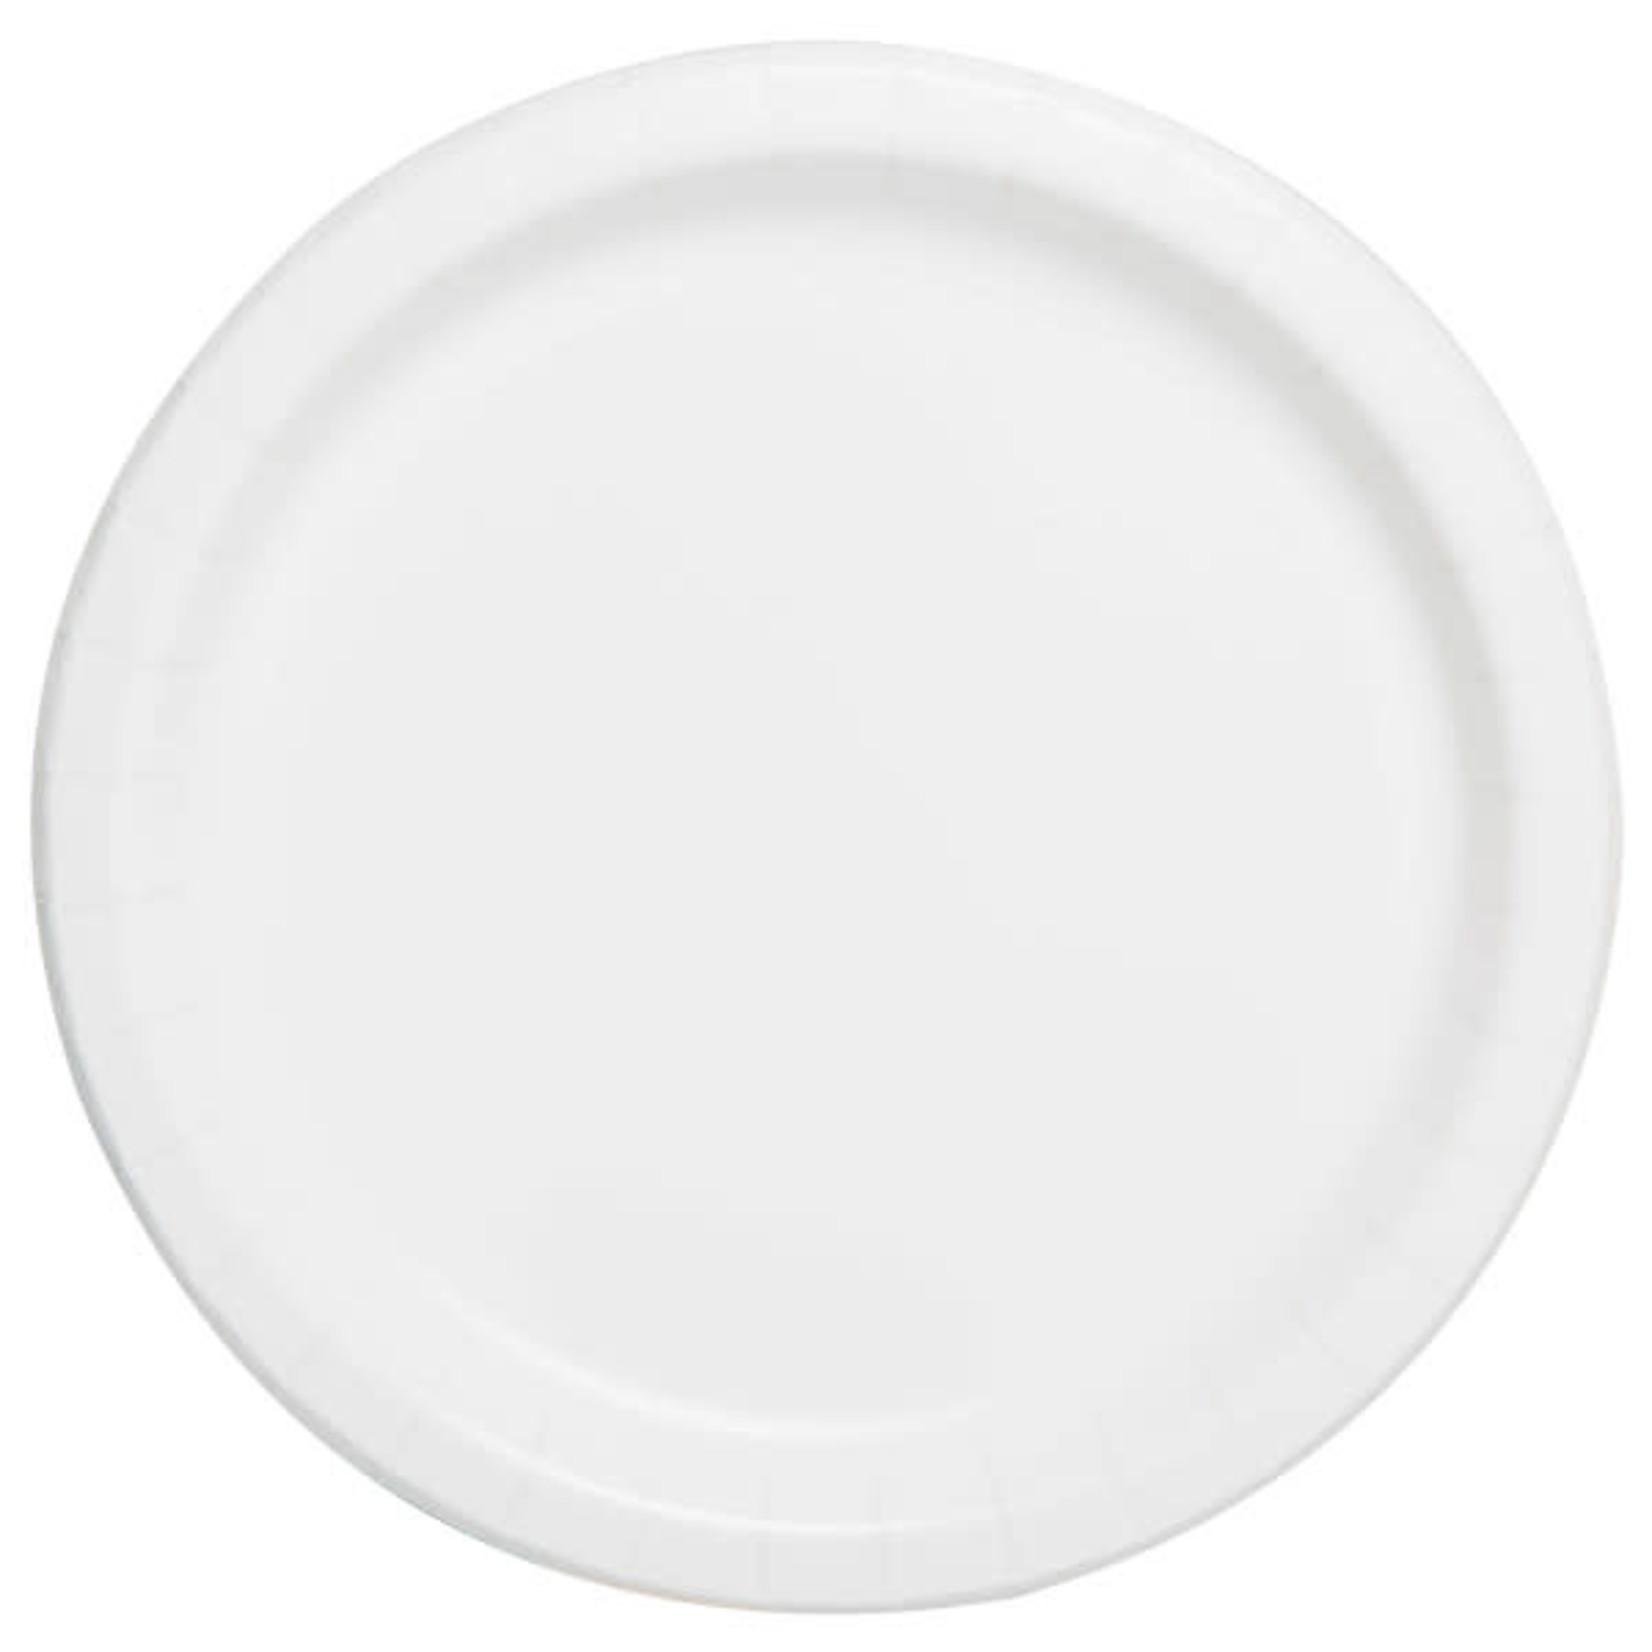 "20PCS  7"" Round Plates BRIGHT WHITE SOLID"